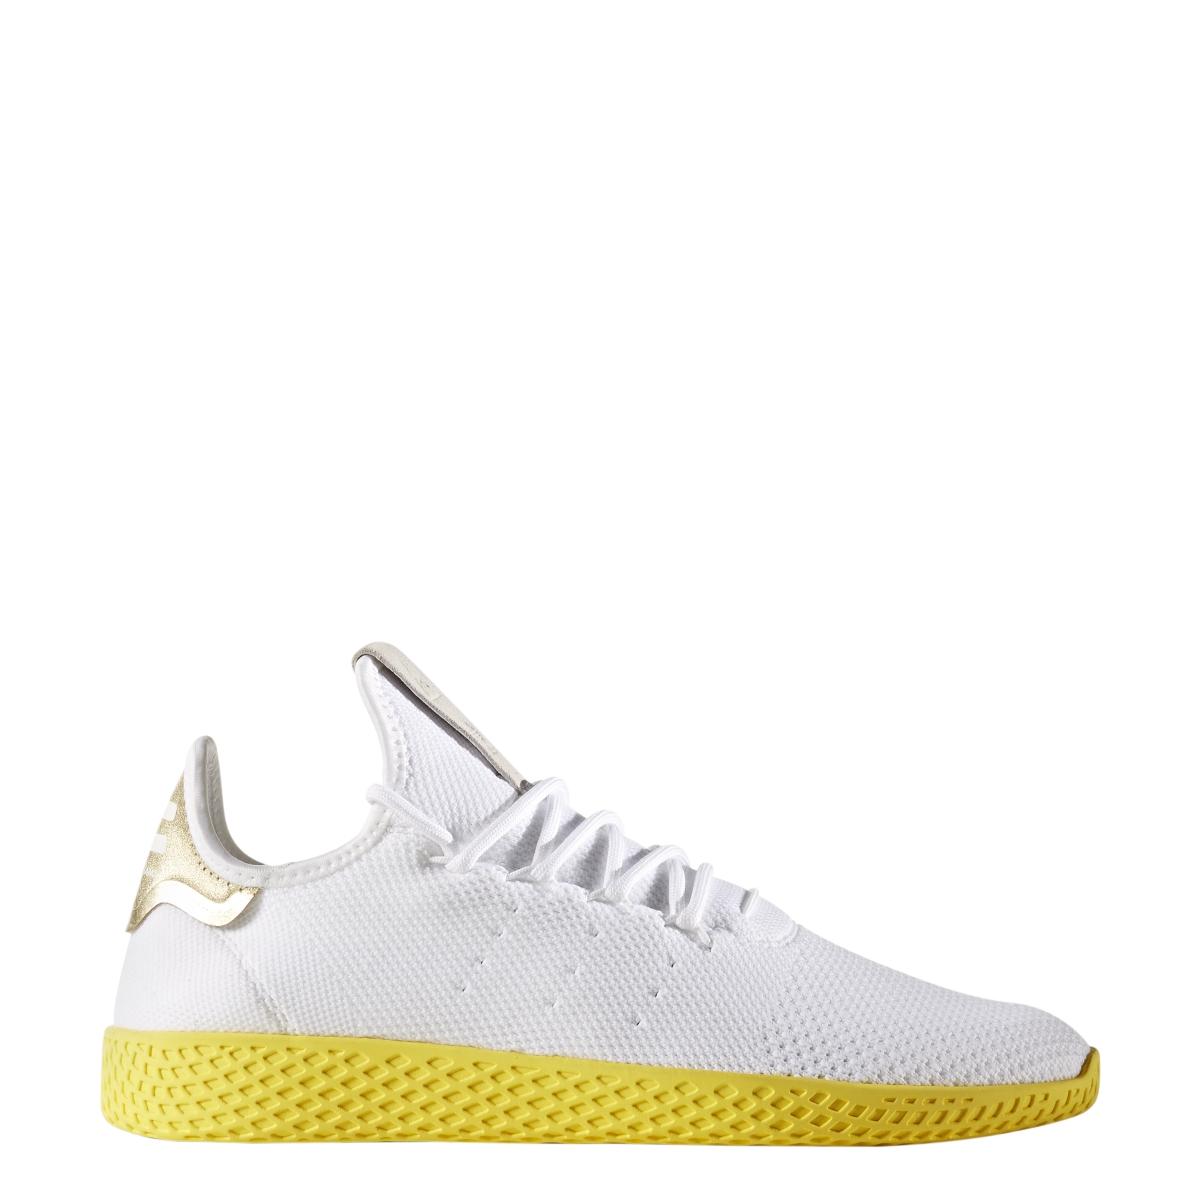 Adidas x Pharrell Williams Tennis Hu in Running White — MAJOR 6a31179ee